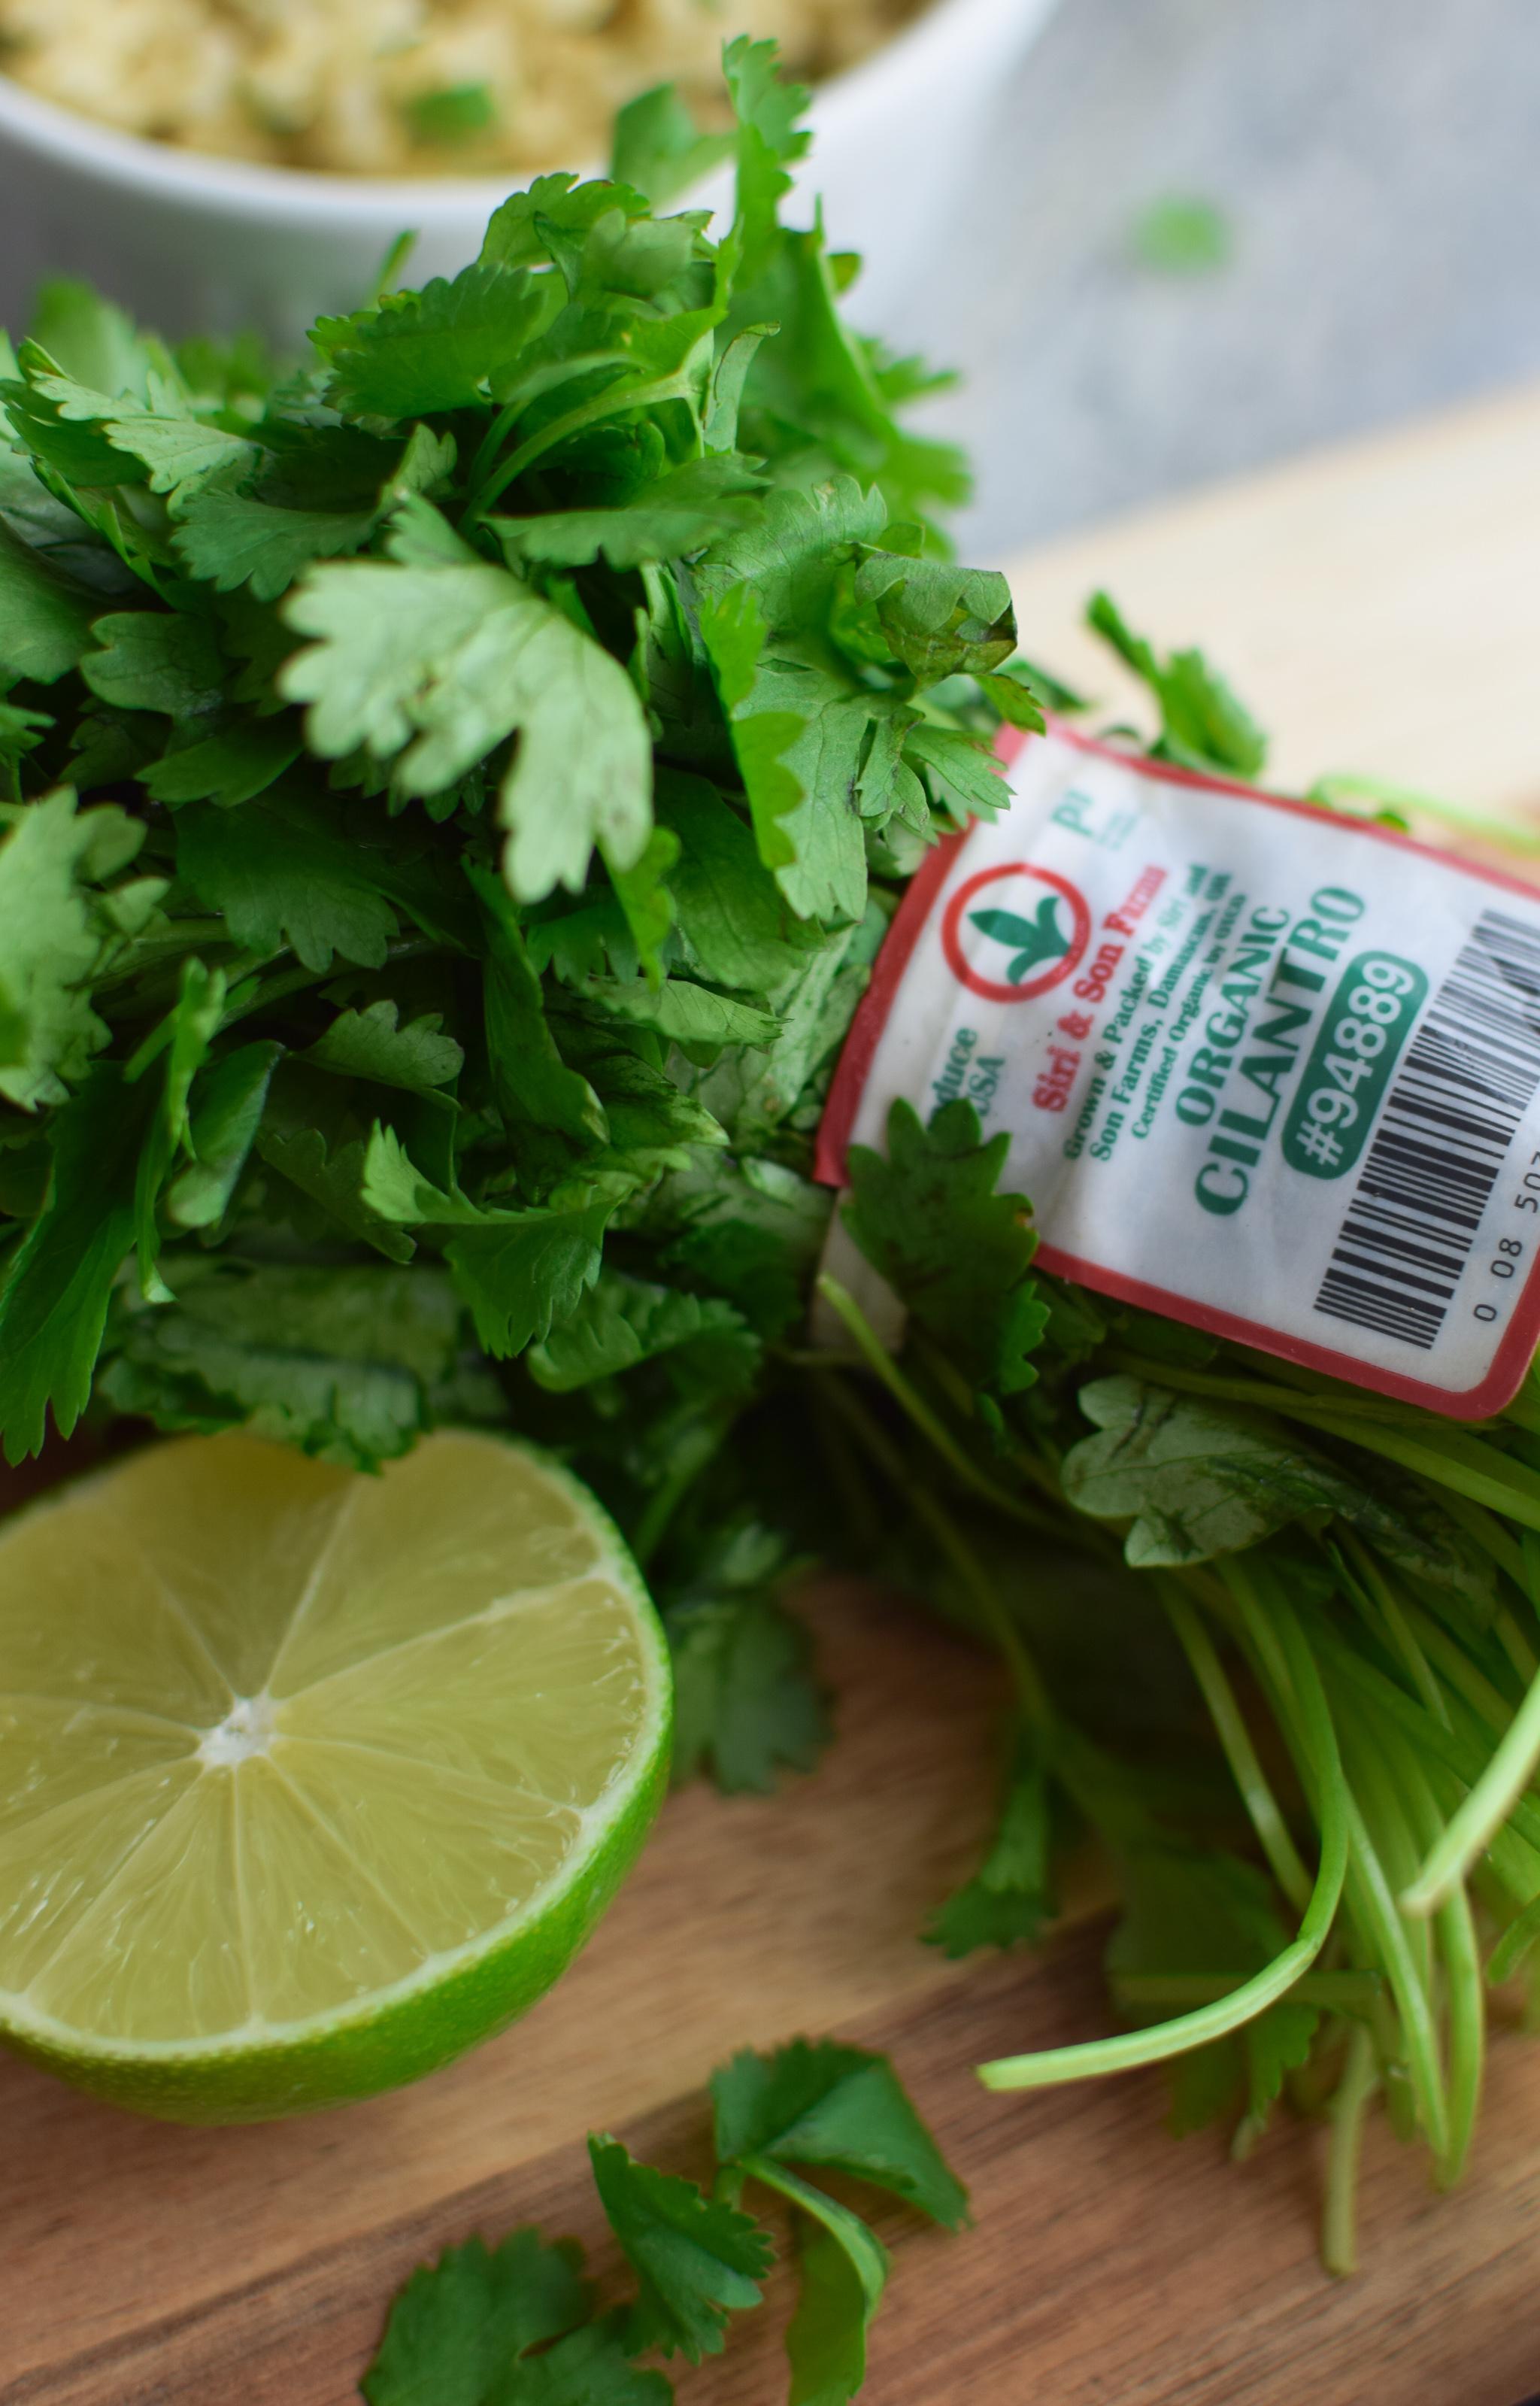 cilantro ready to be cut up for the cilantro lime quinoa